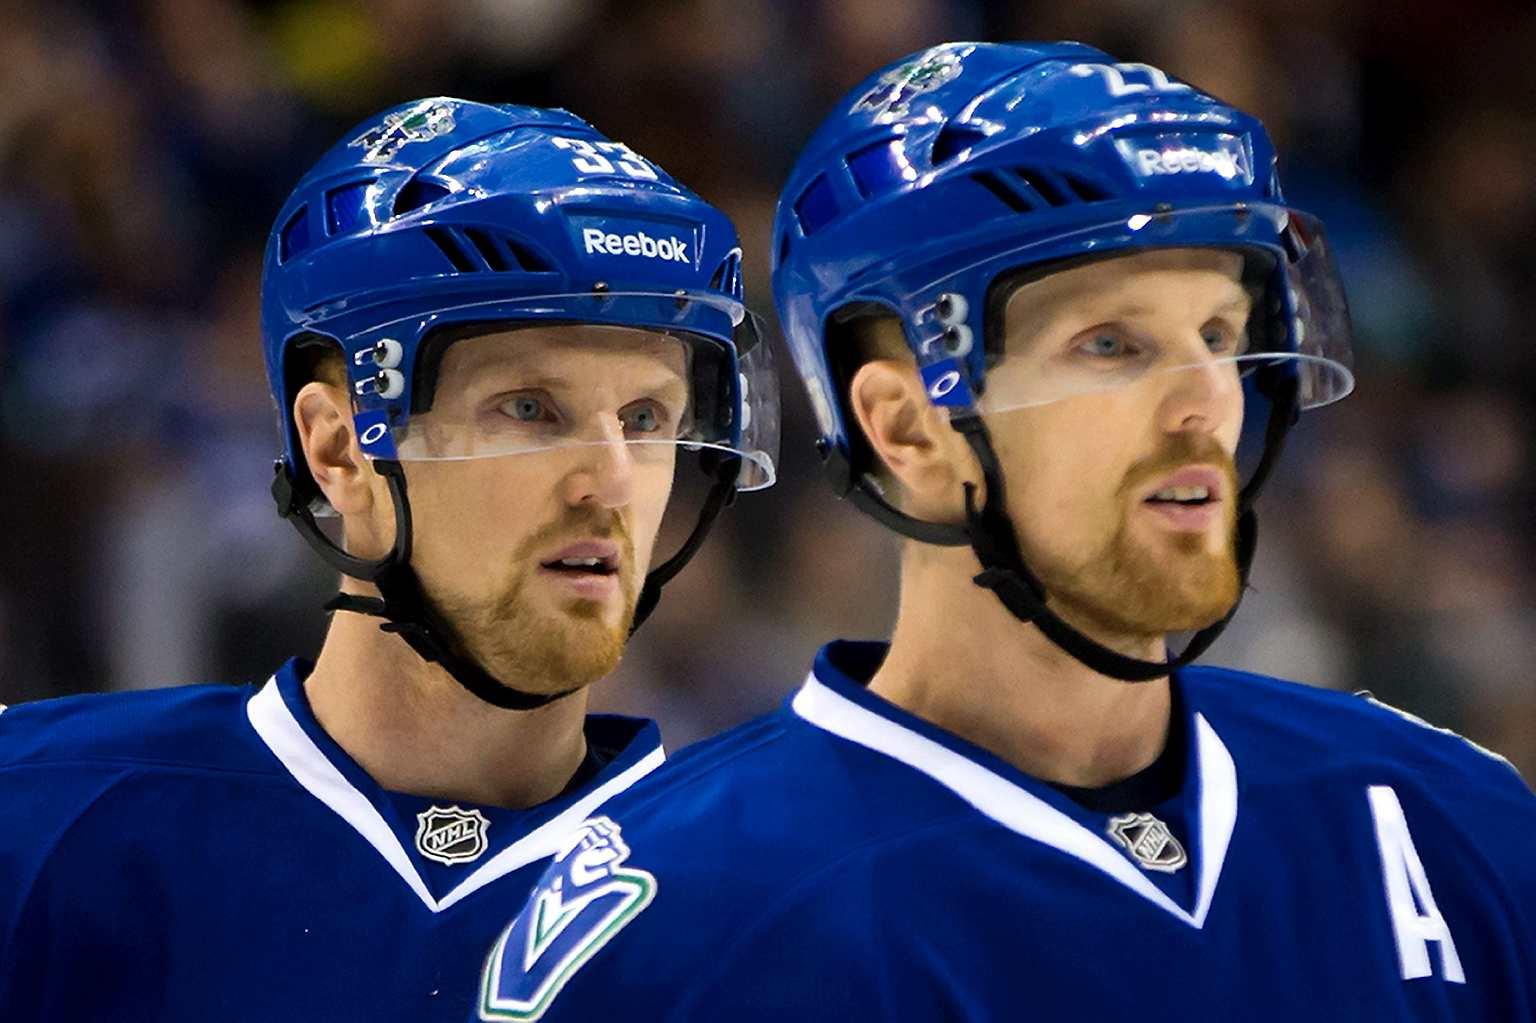 Daniel and Henrik Sedin's Final NHL Game - Behind-the ...